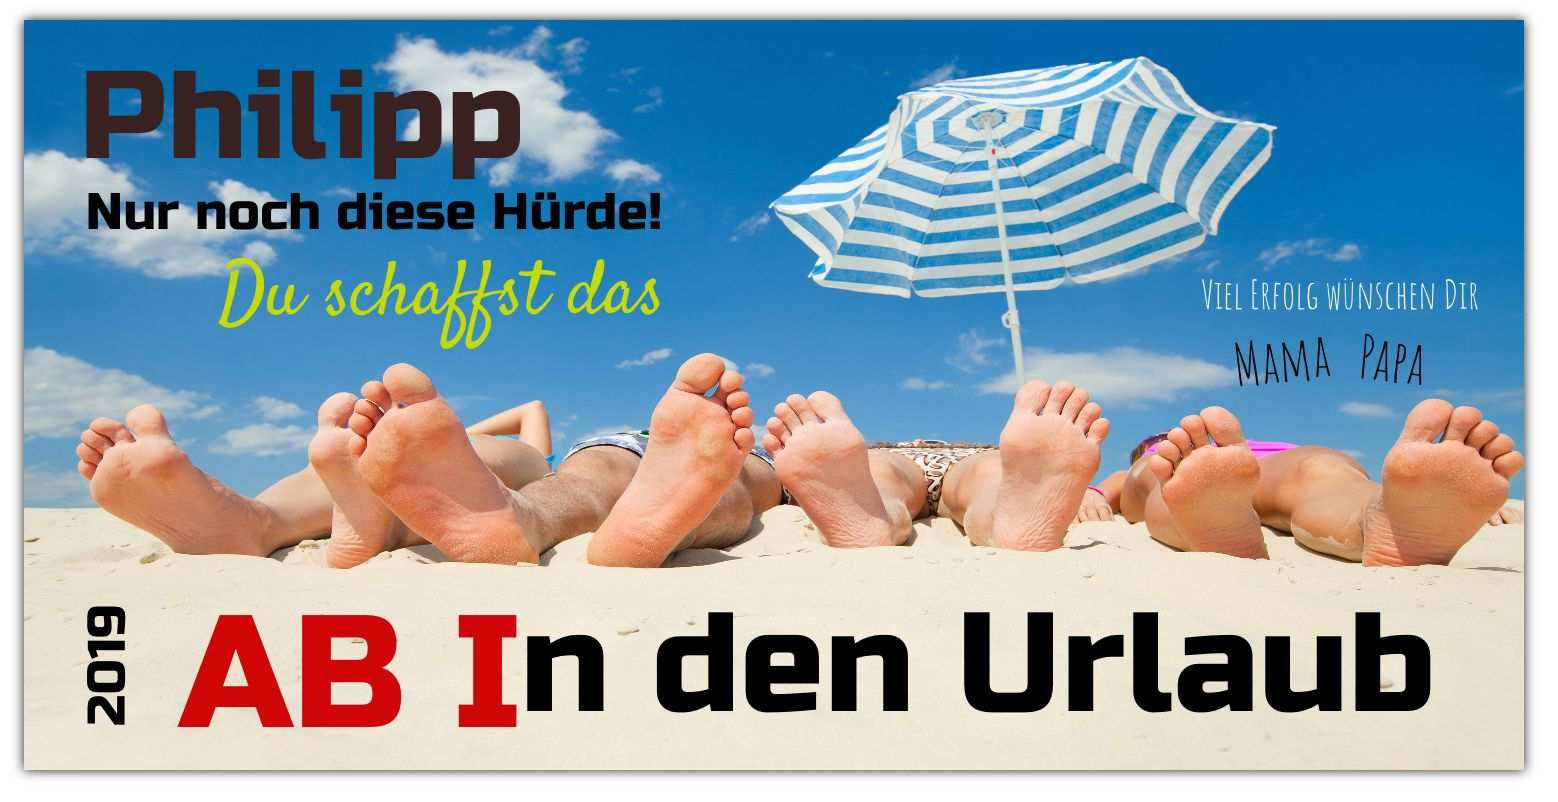 Abi Banner Ab In Den Urlaub Abi Plakate Abi Plakat Spruche